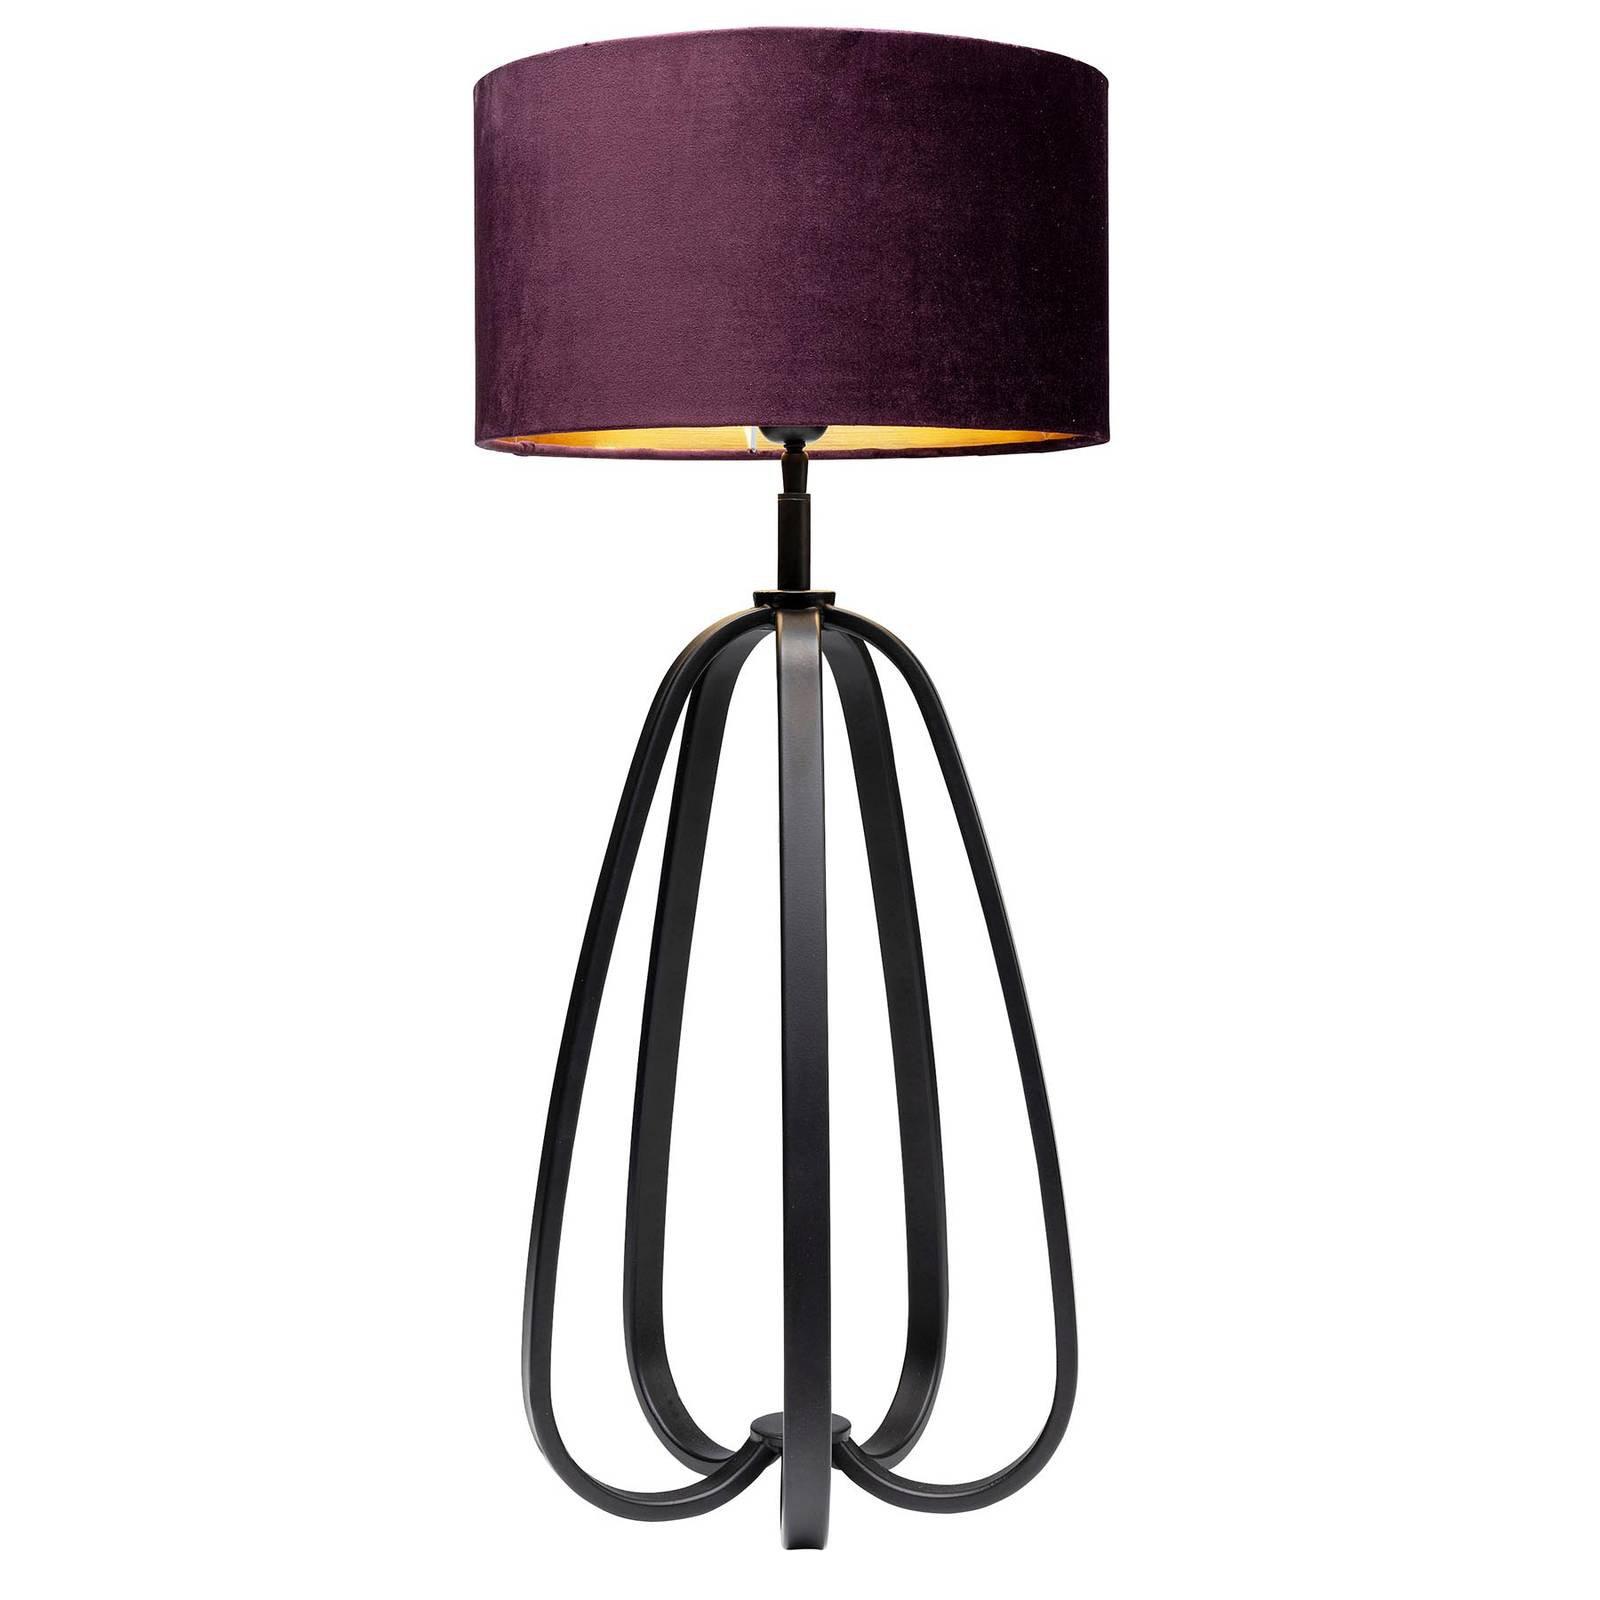 KARE Loop bordlampe med tekstilskjerm, lilla